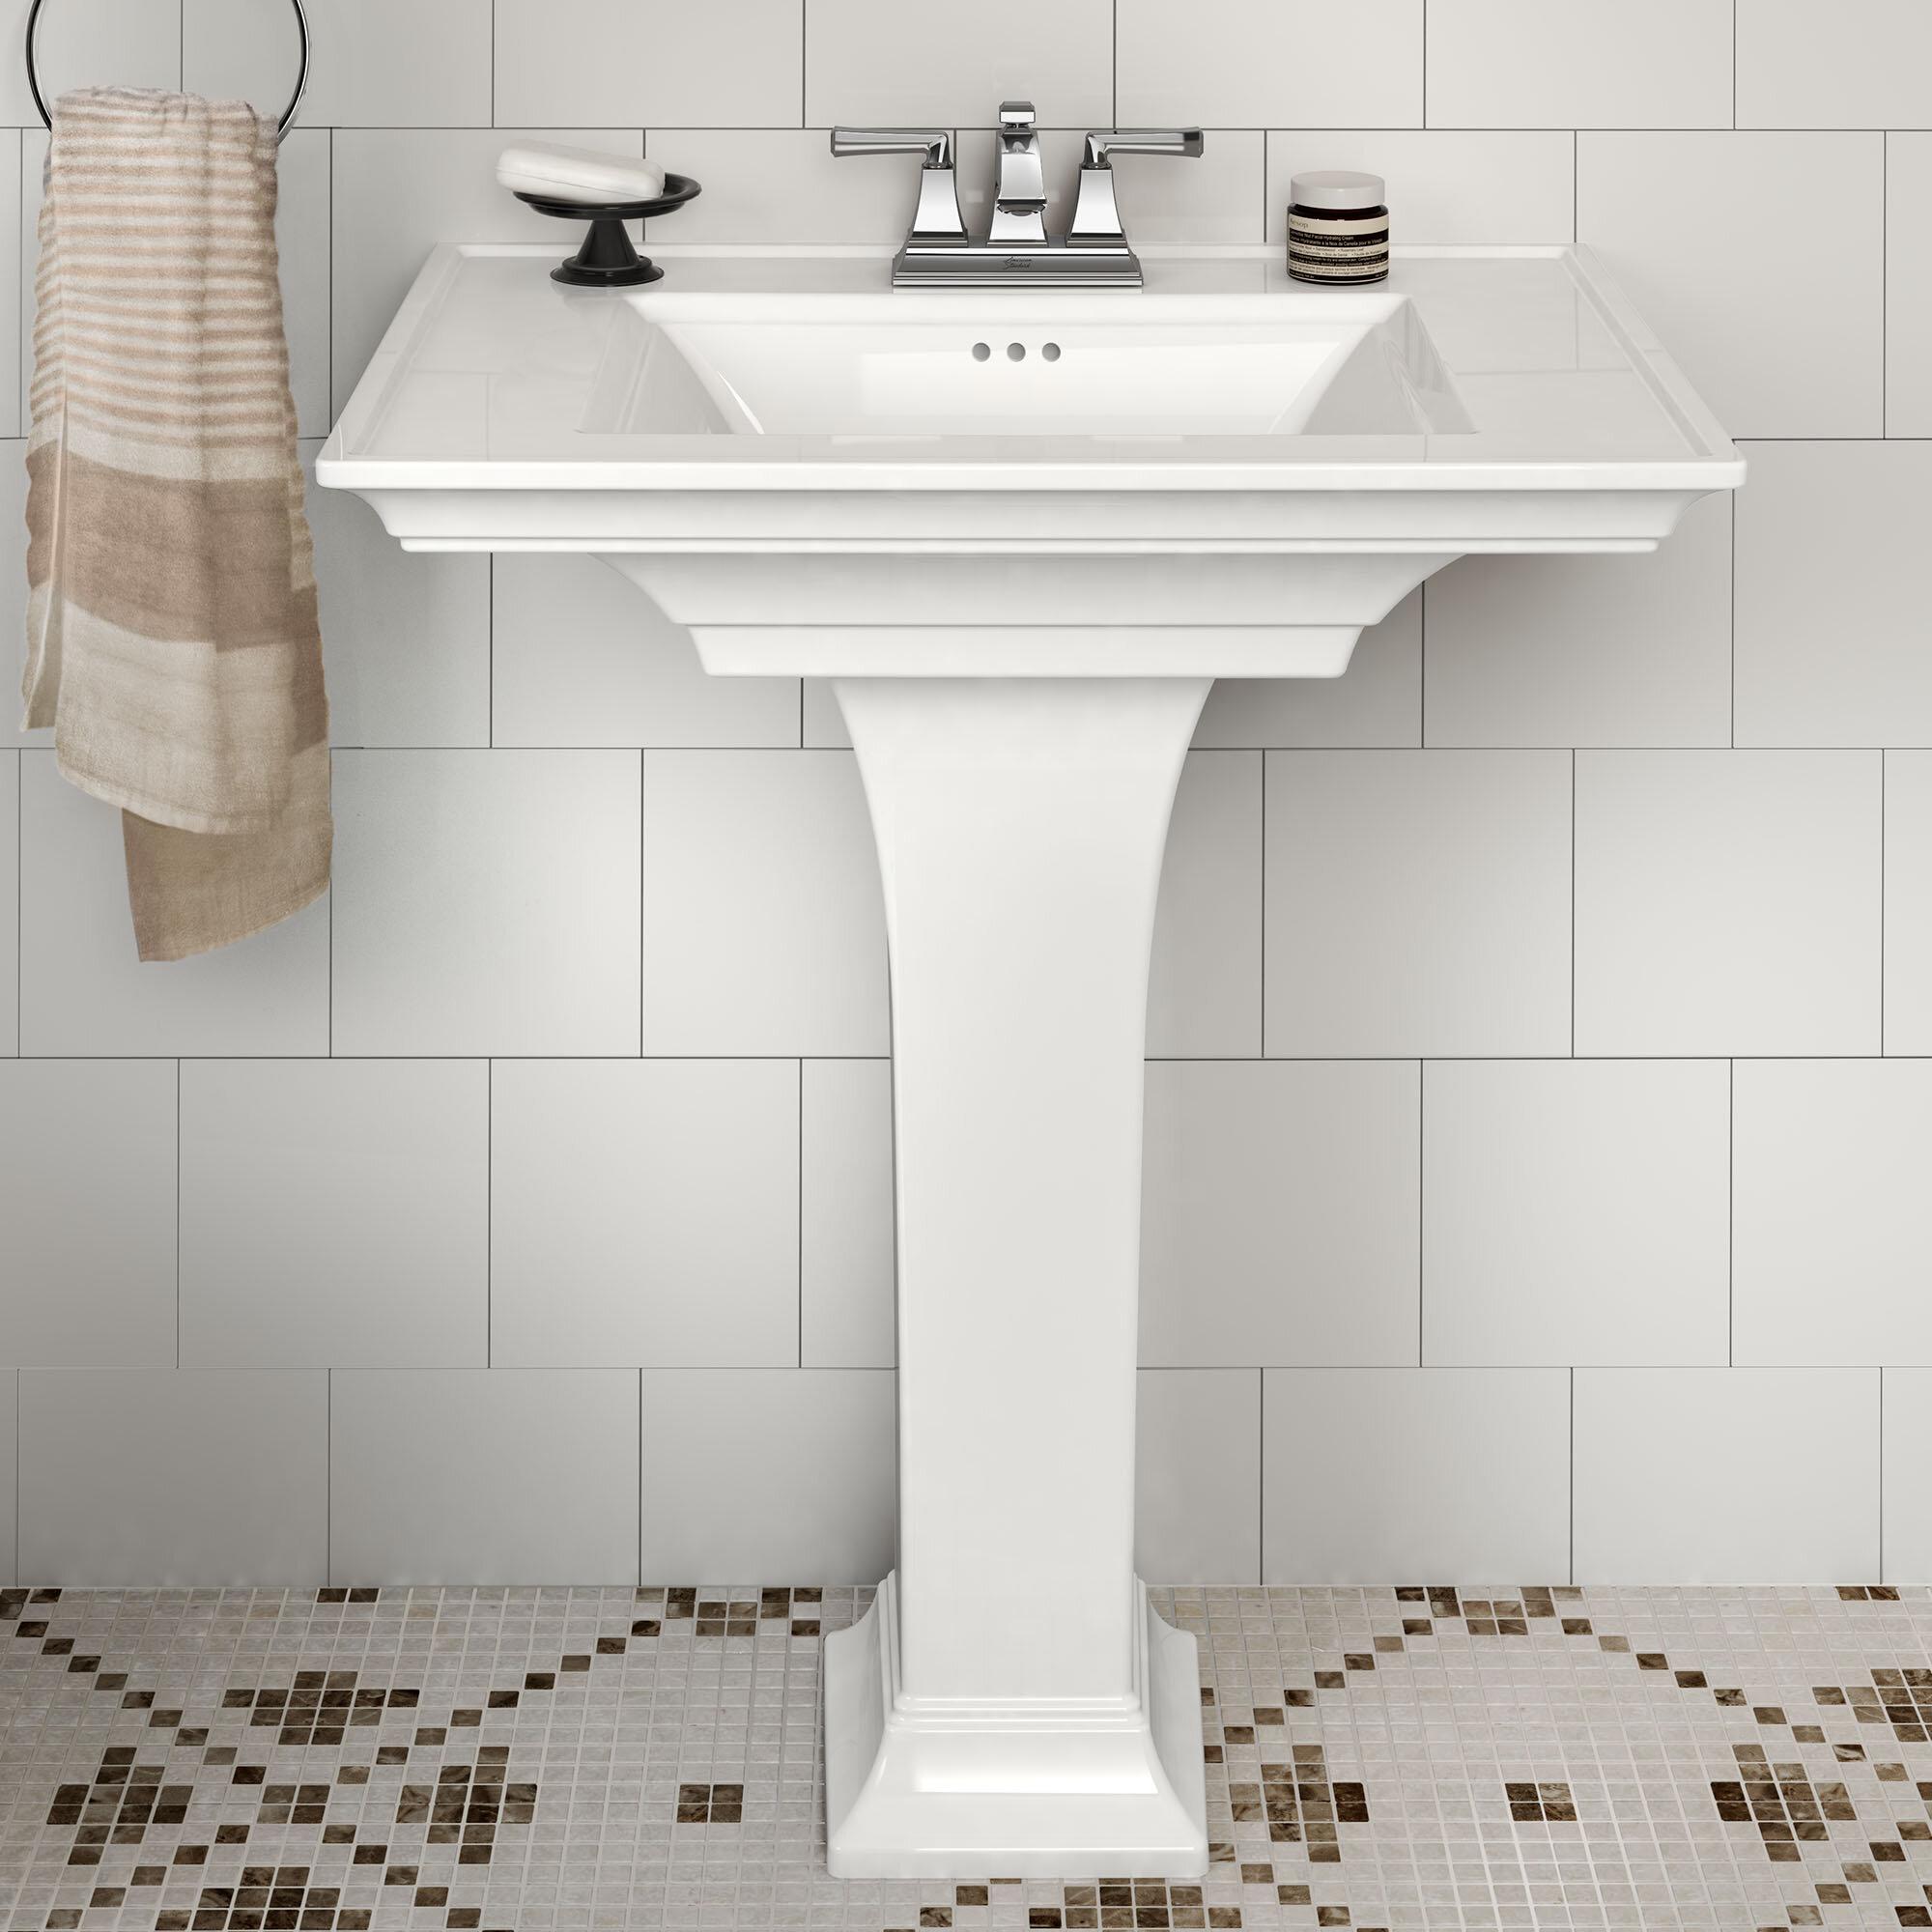 American Standard Town Ceramic Rectangular Pedestal Bathroom Sink